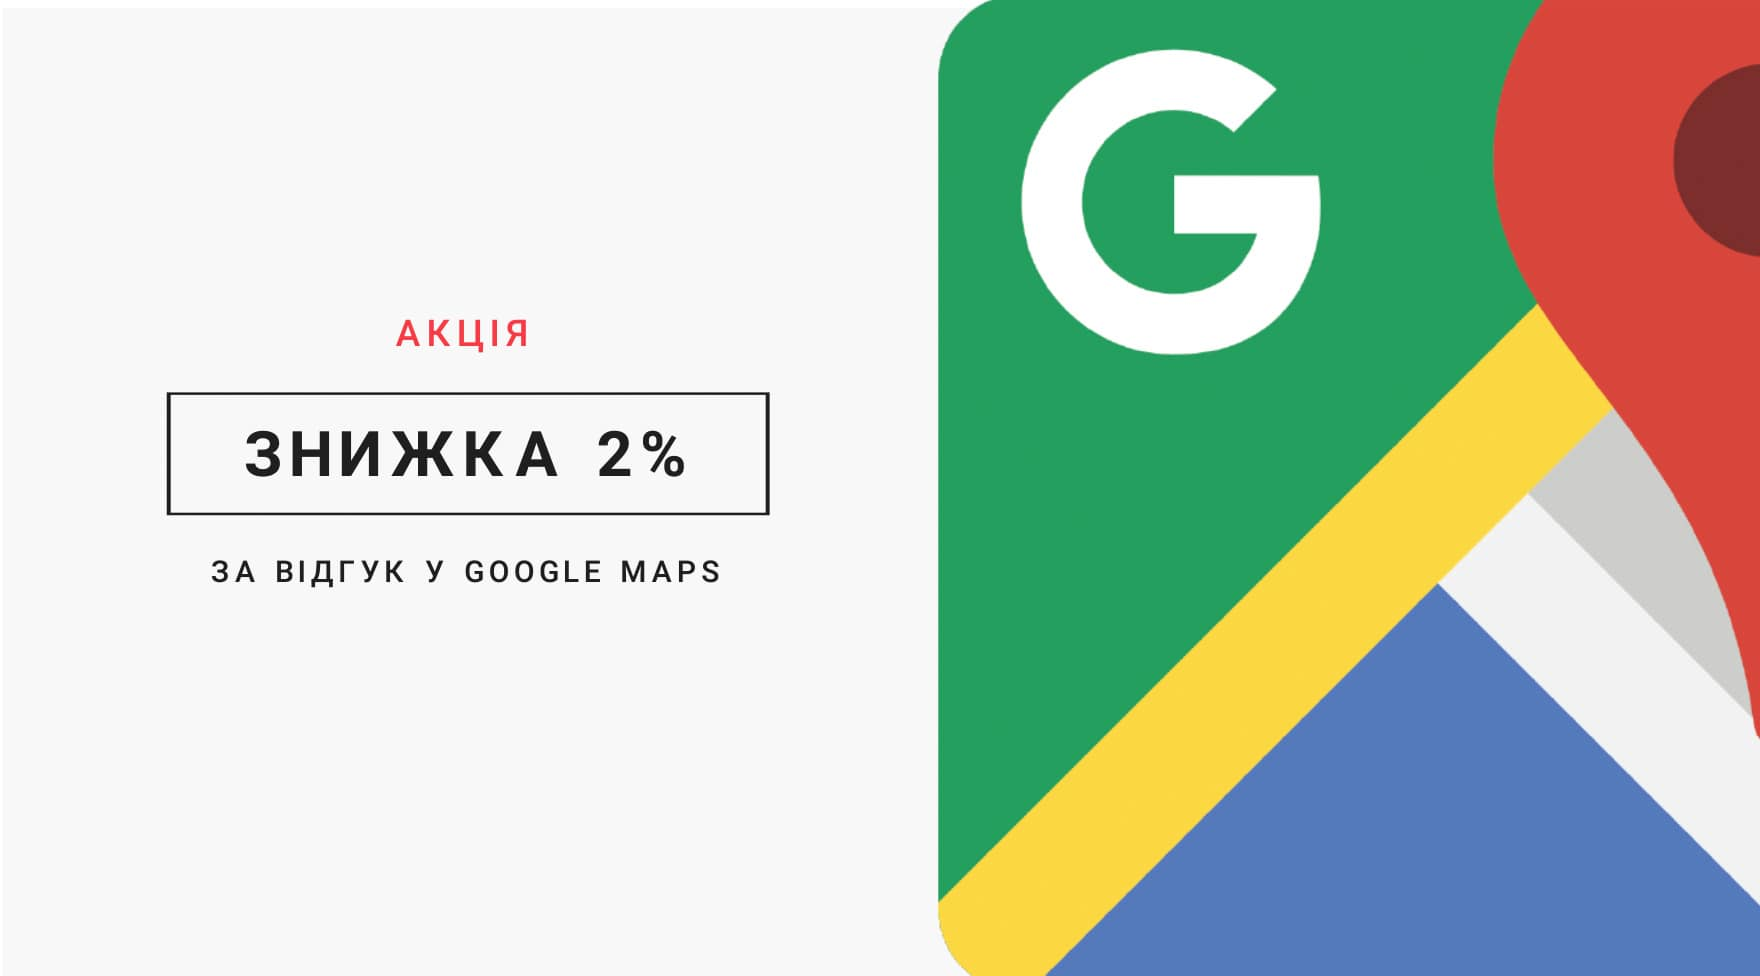 Знижка 2% за відгук в Google Maps